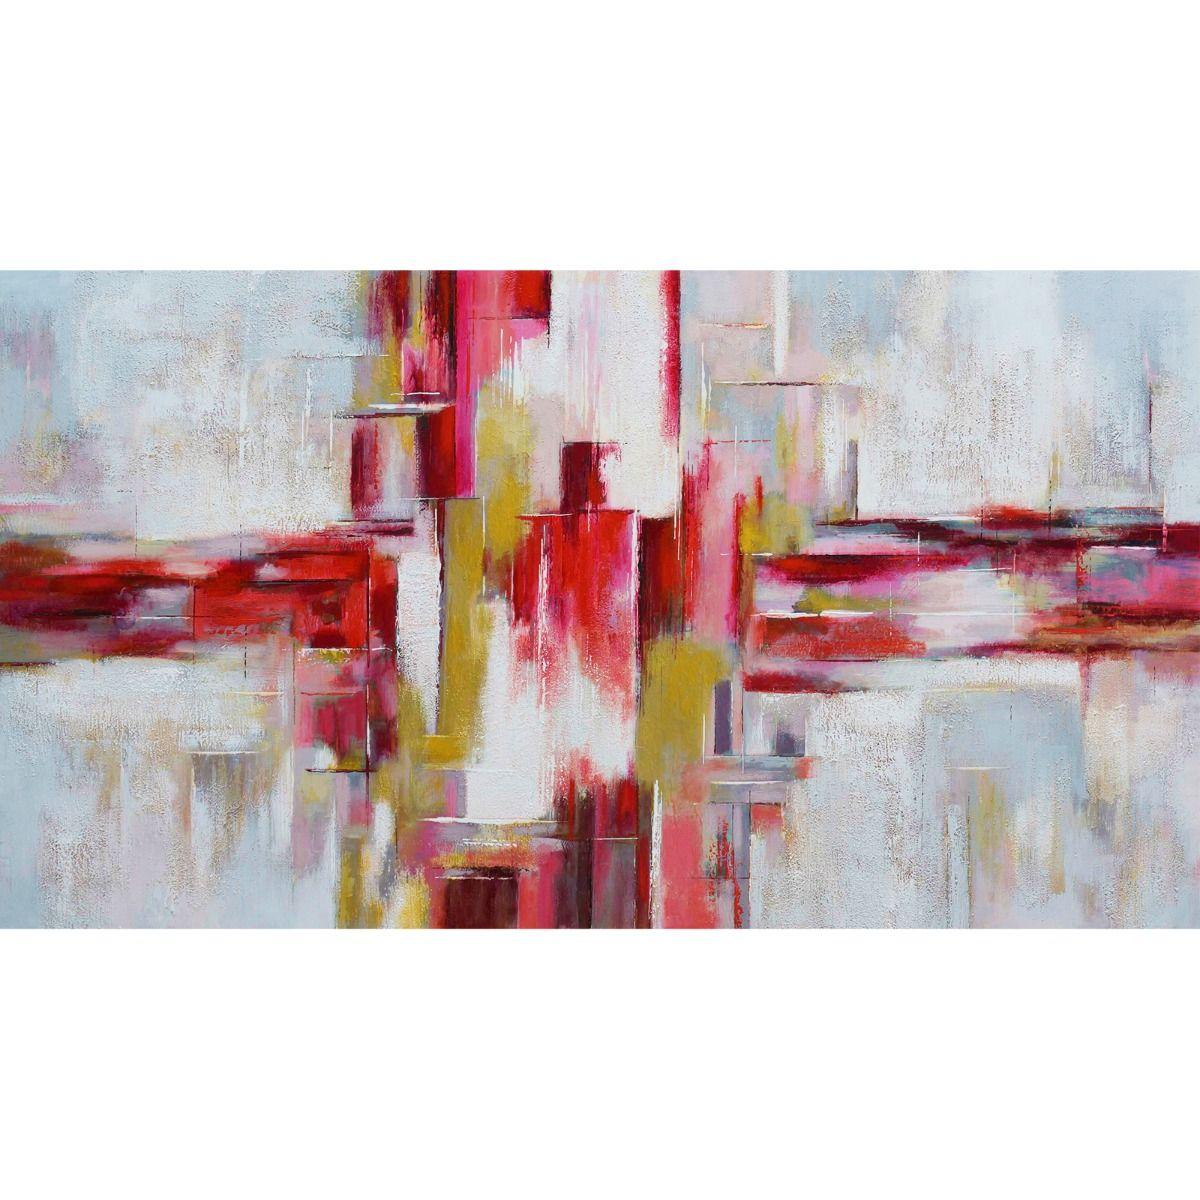 Serie ABSTRACTO | Cuadro abstracto rojo (180 x 97 cm)